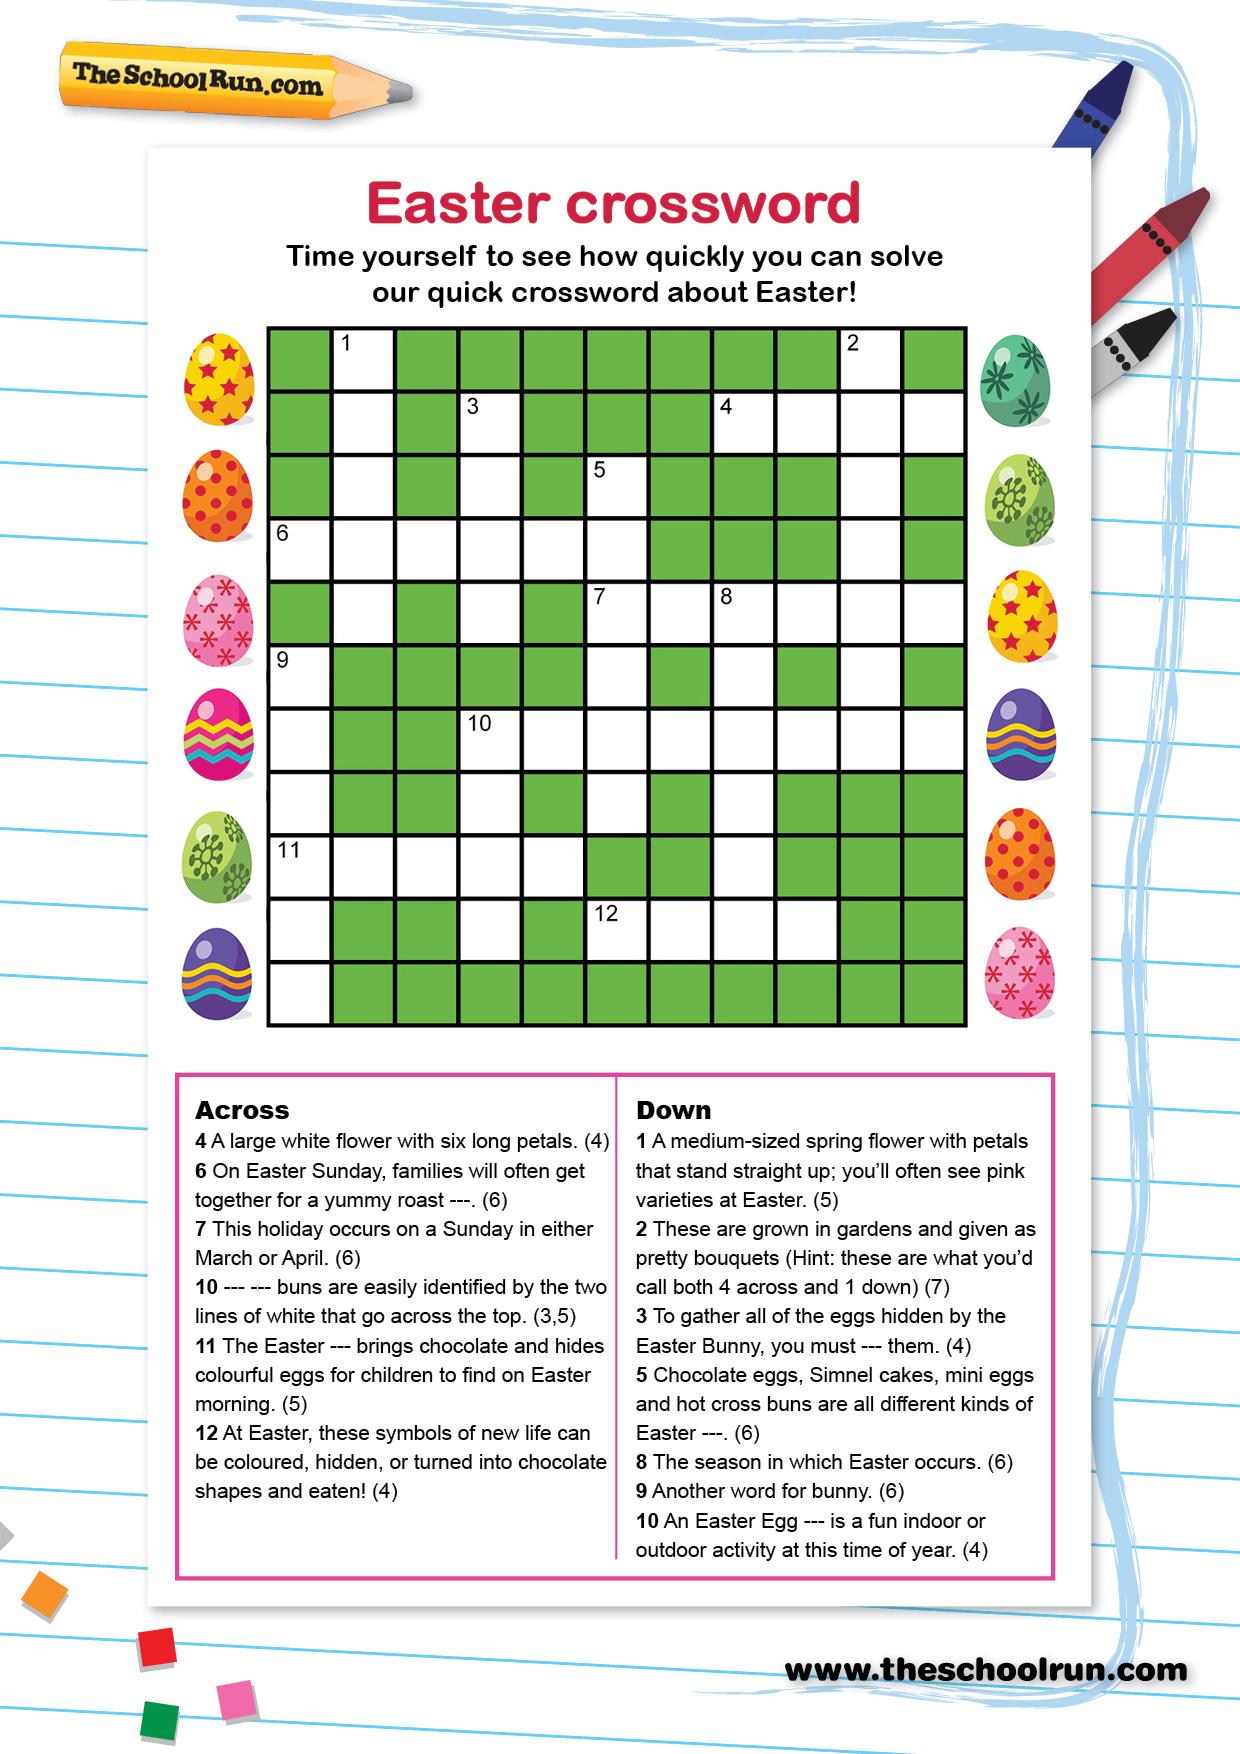 Word Puzzles For Primary School Children | Theschoolrun - Printable Puzzles Ks1